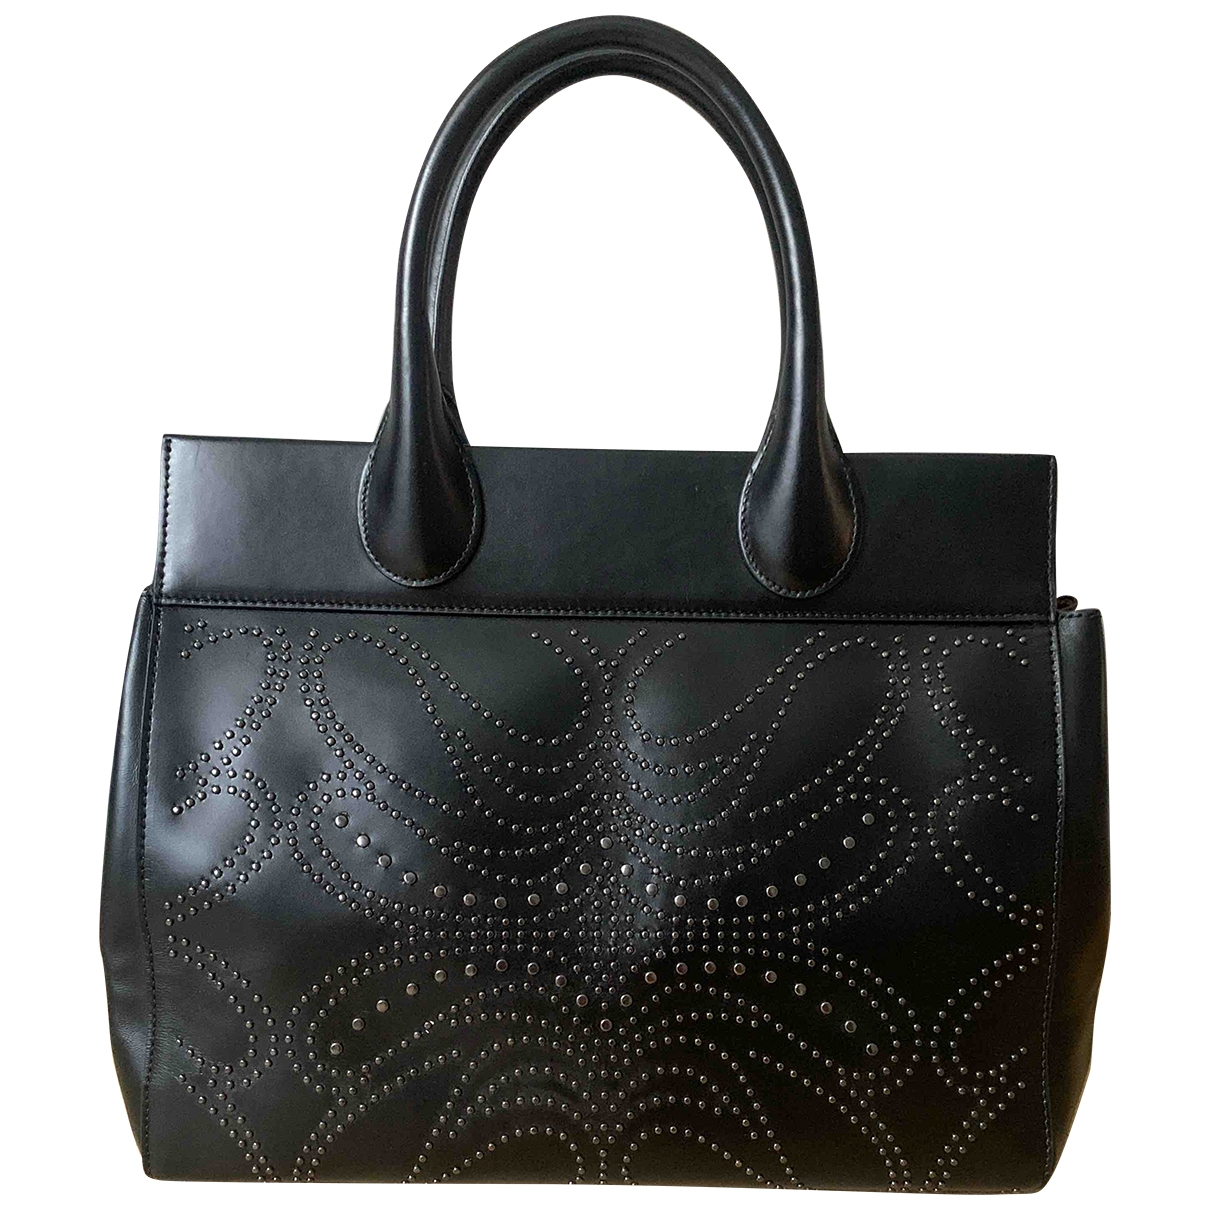 Alaïa \N Black Leather handbag for Women \N